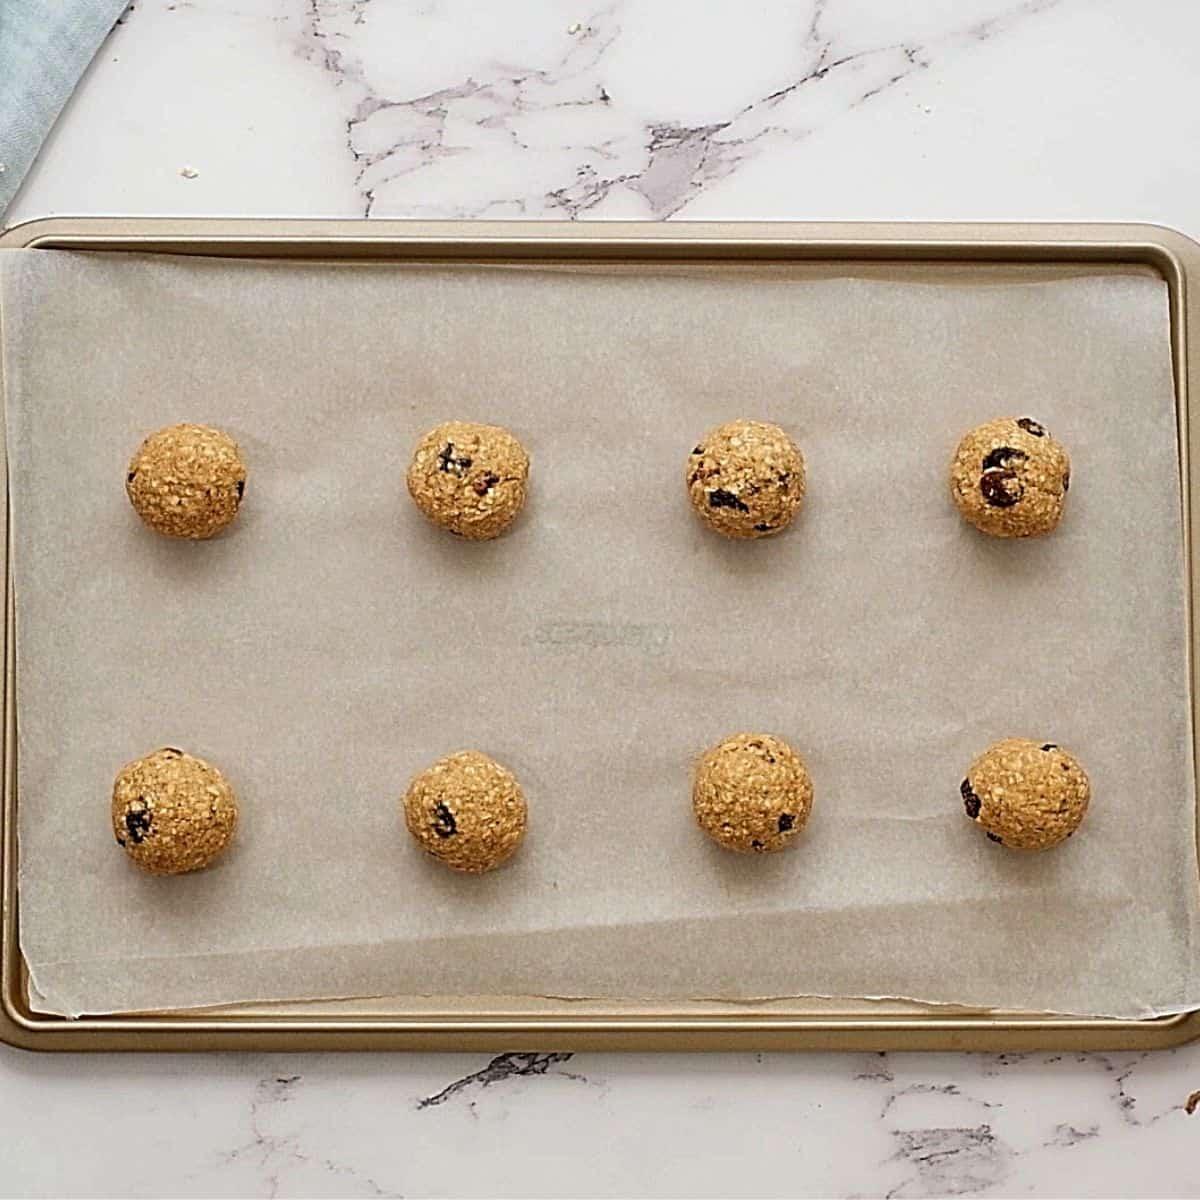 Balls of Oatmeal Raisin Cookie Dough on Baking sheet.